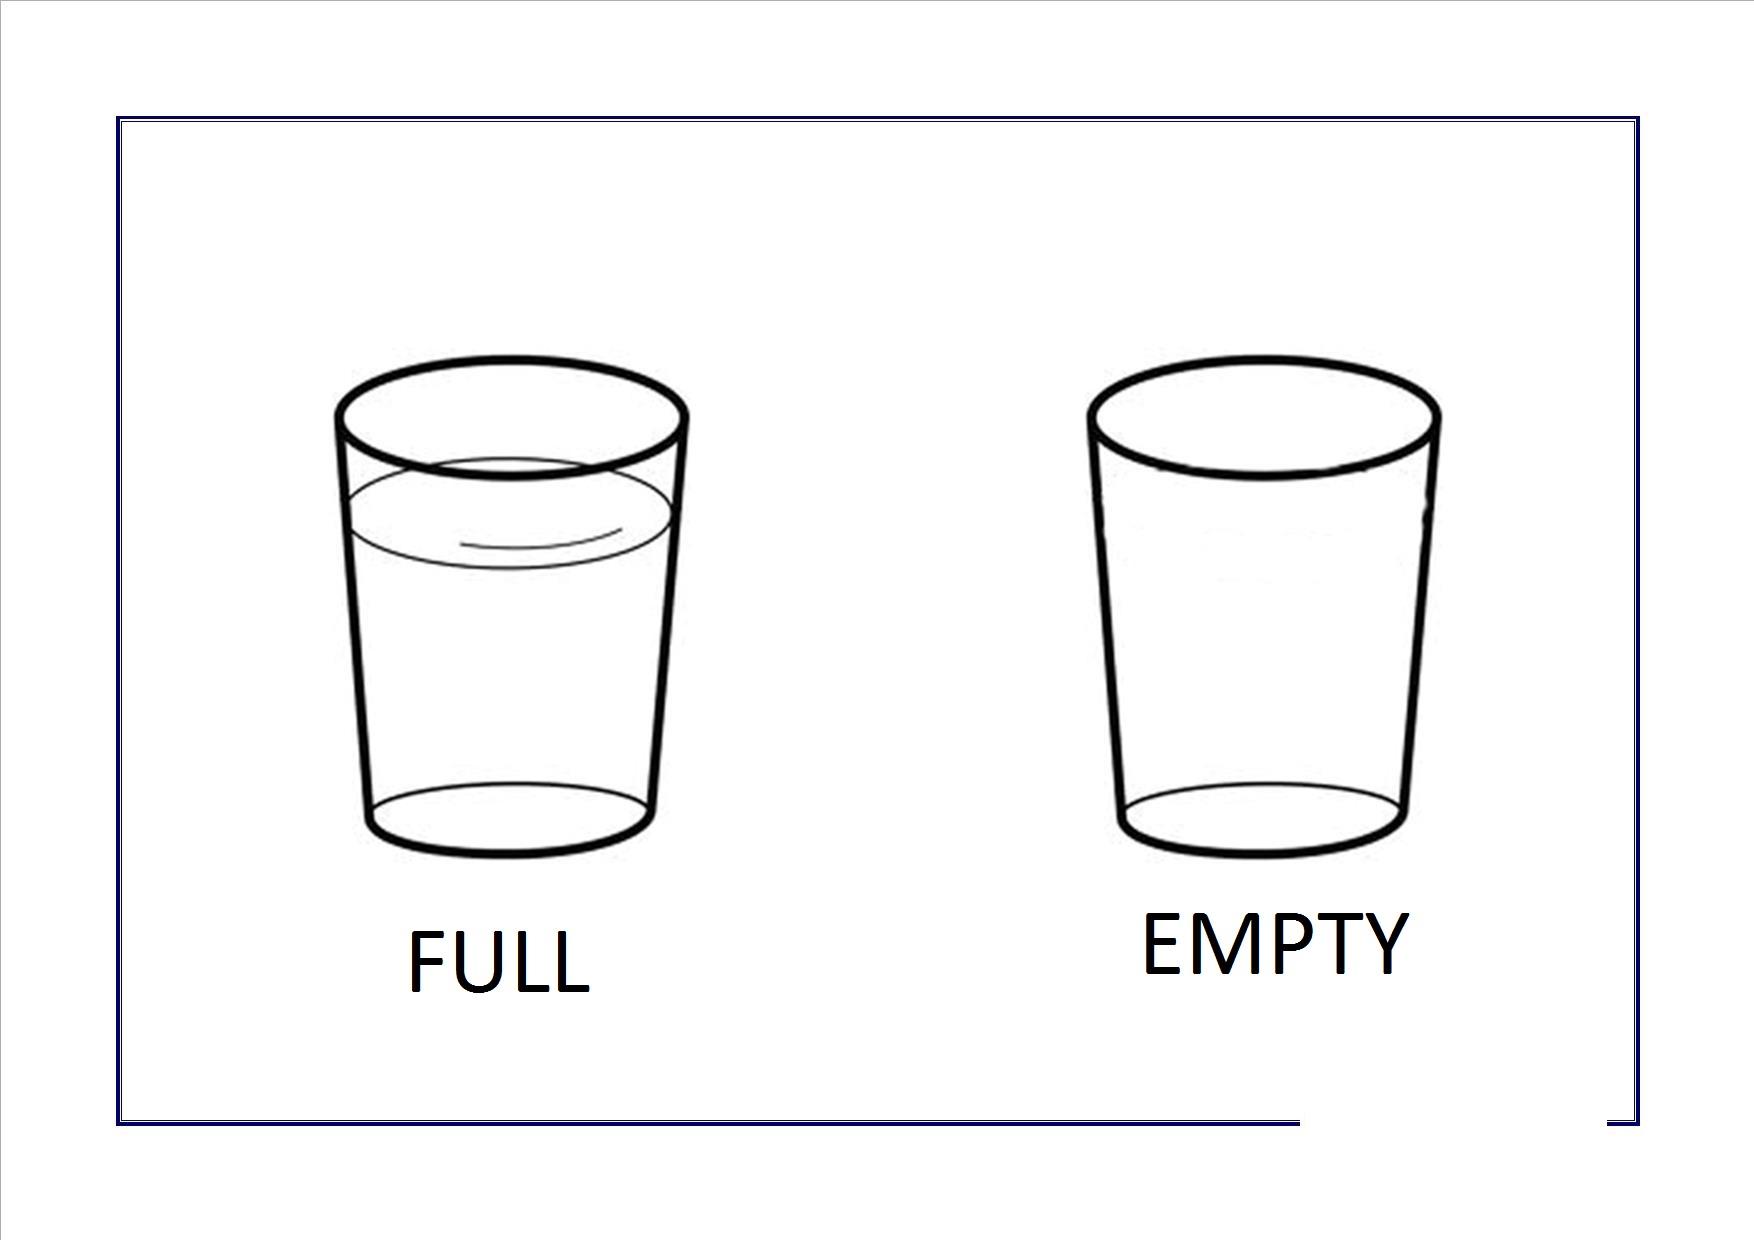 full_or_empty_easy_worksheets (7)